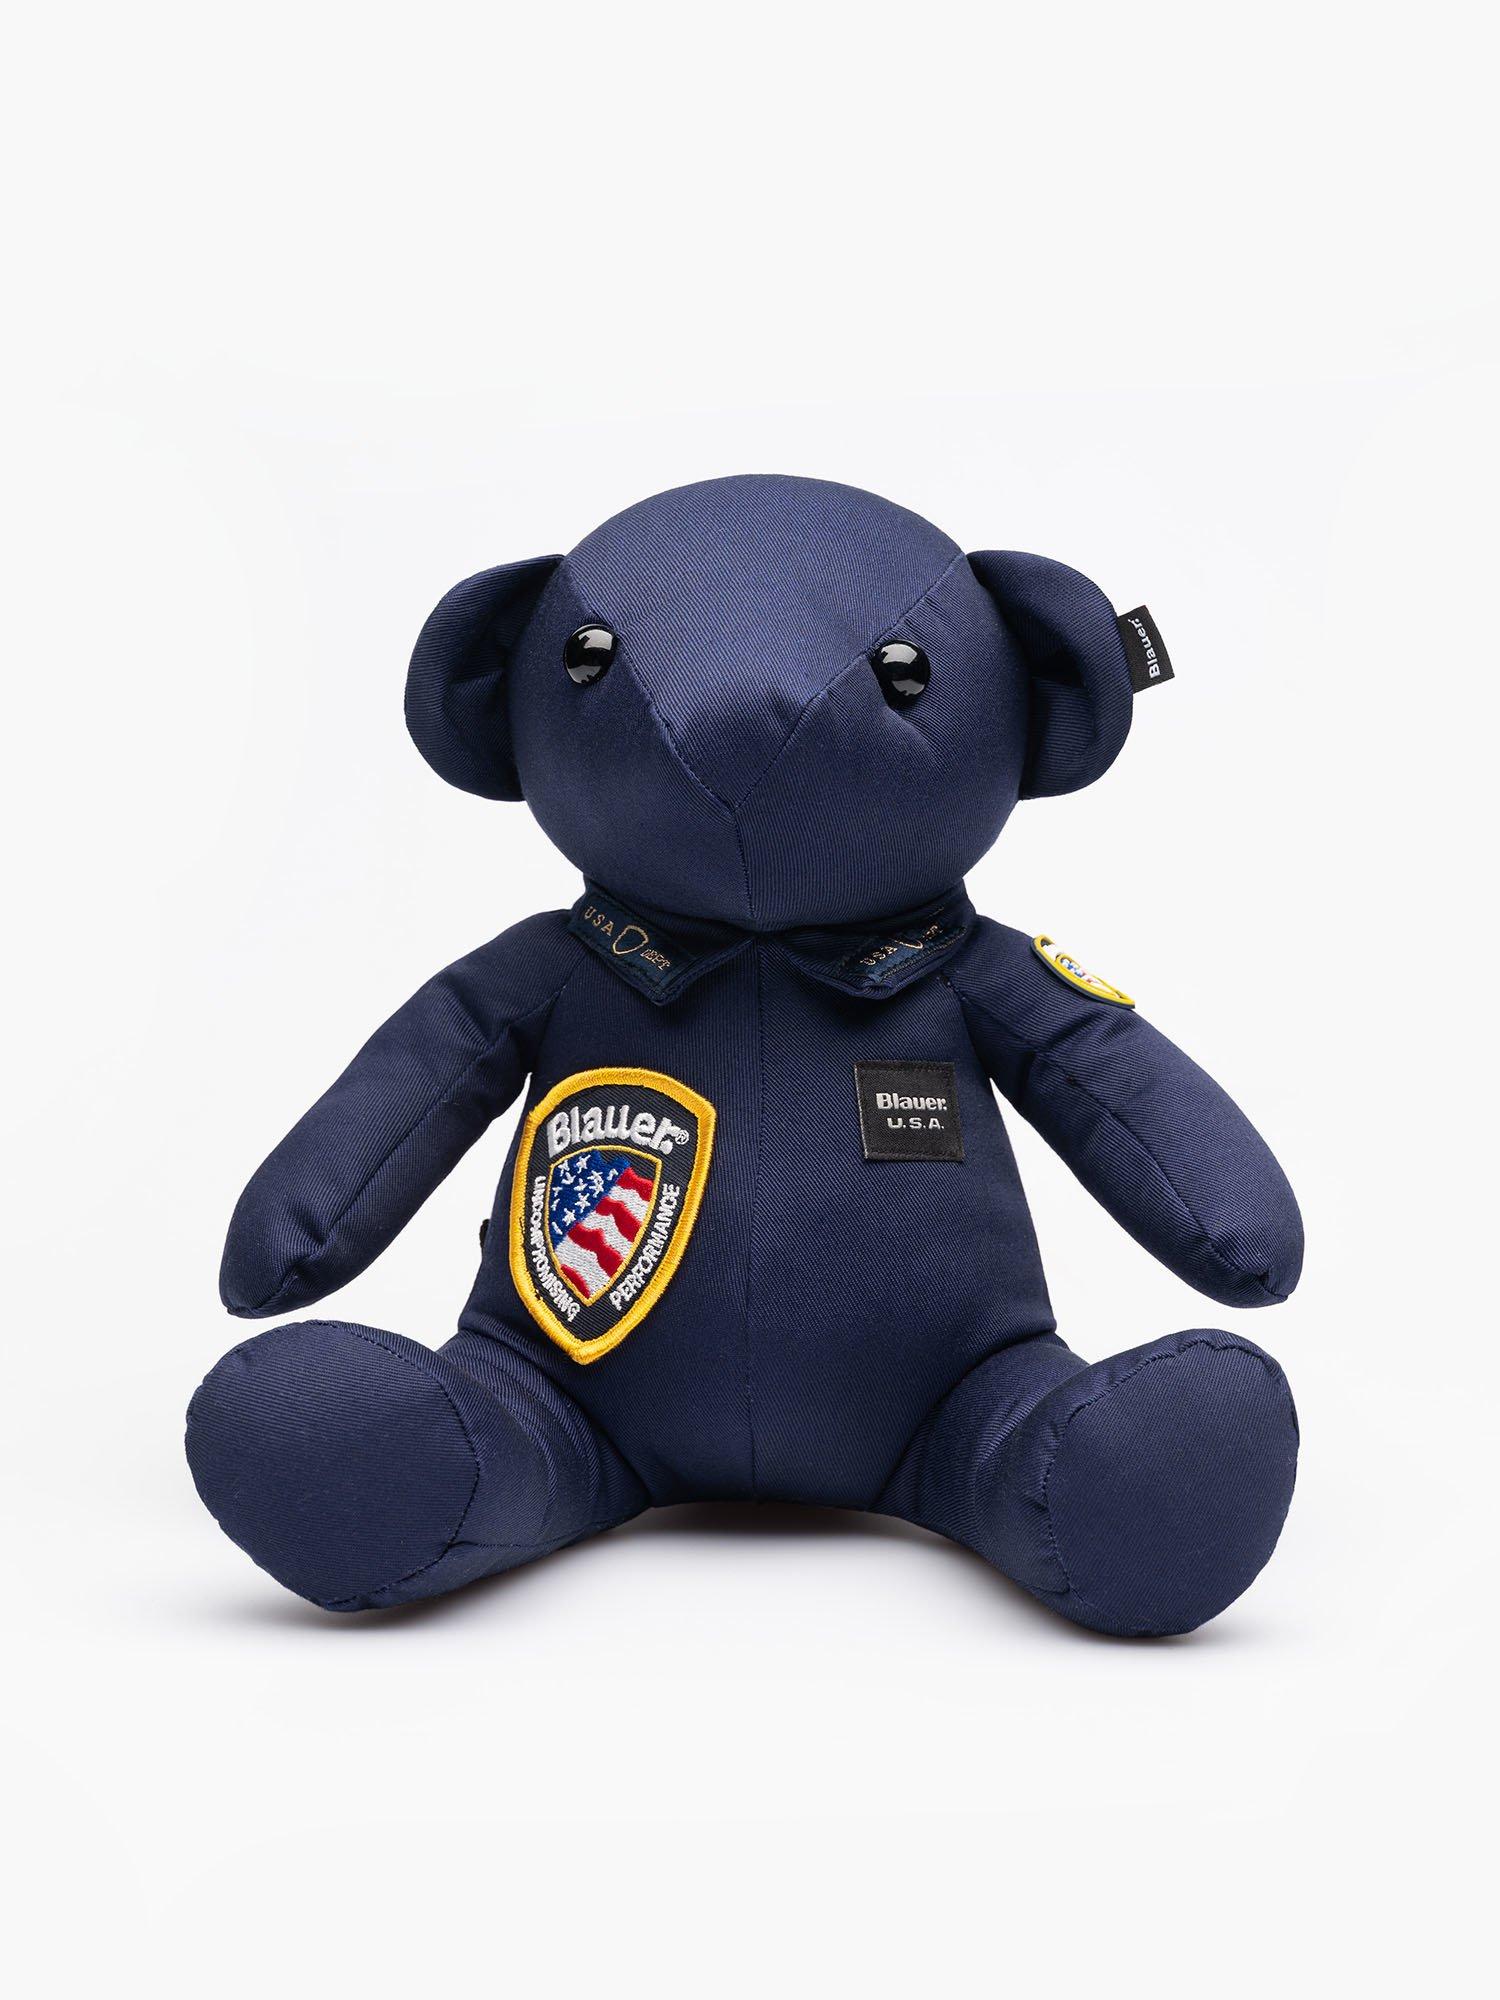 TEDDY BLAUER POLICE BEAR MASCOT - Blauer